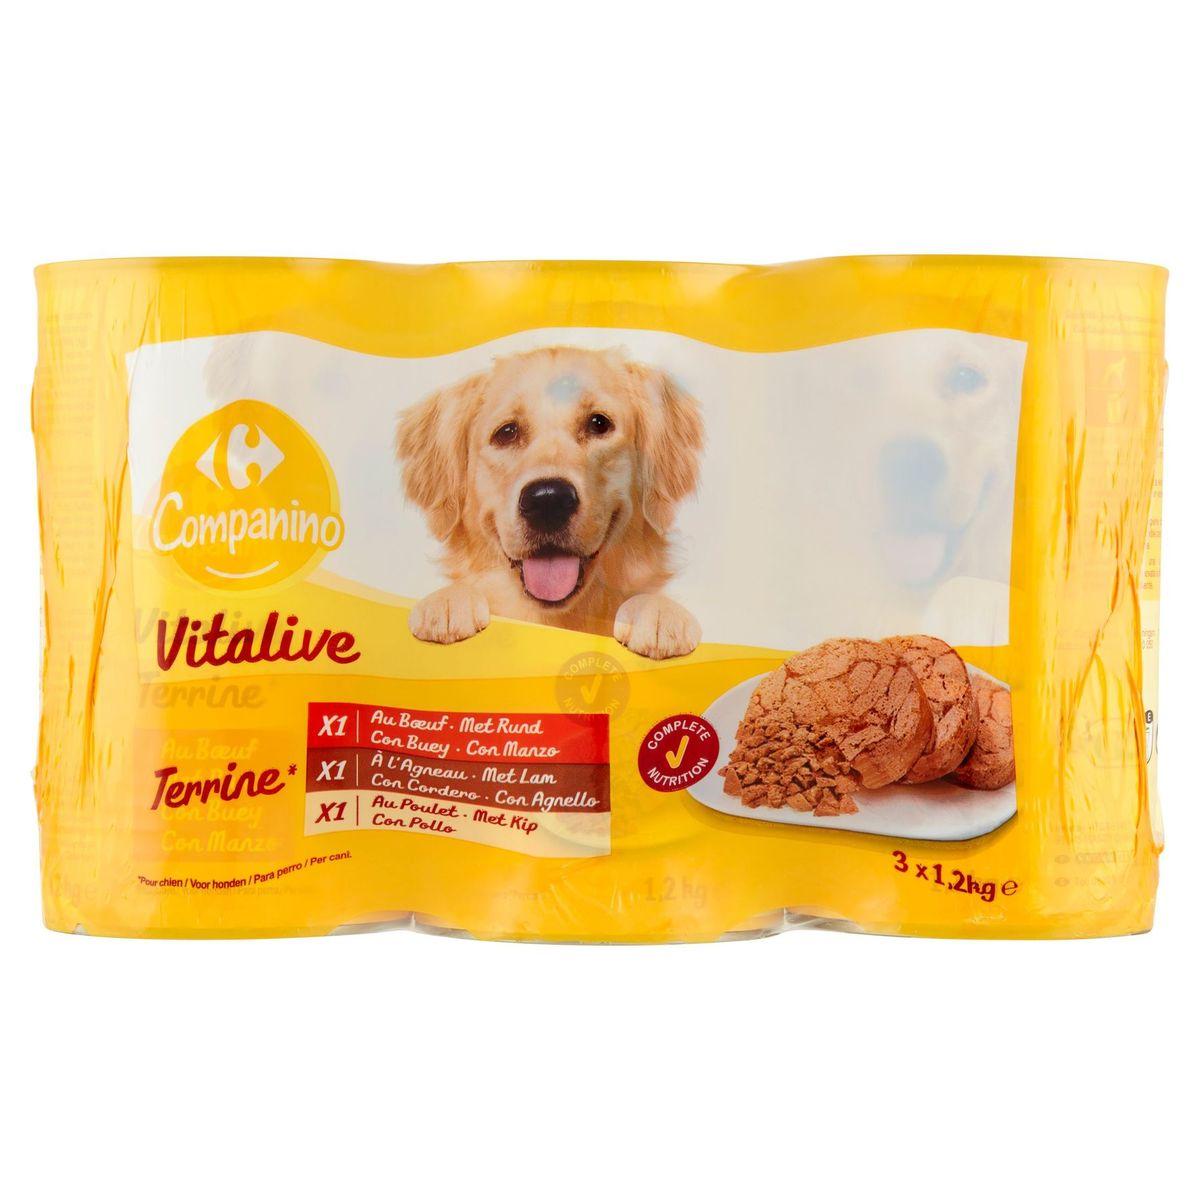 Carrefour Paté Assortiment voor Honden 3 x 1230 g